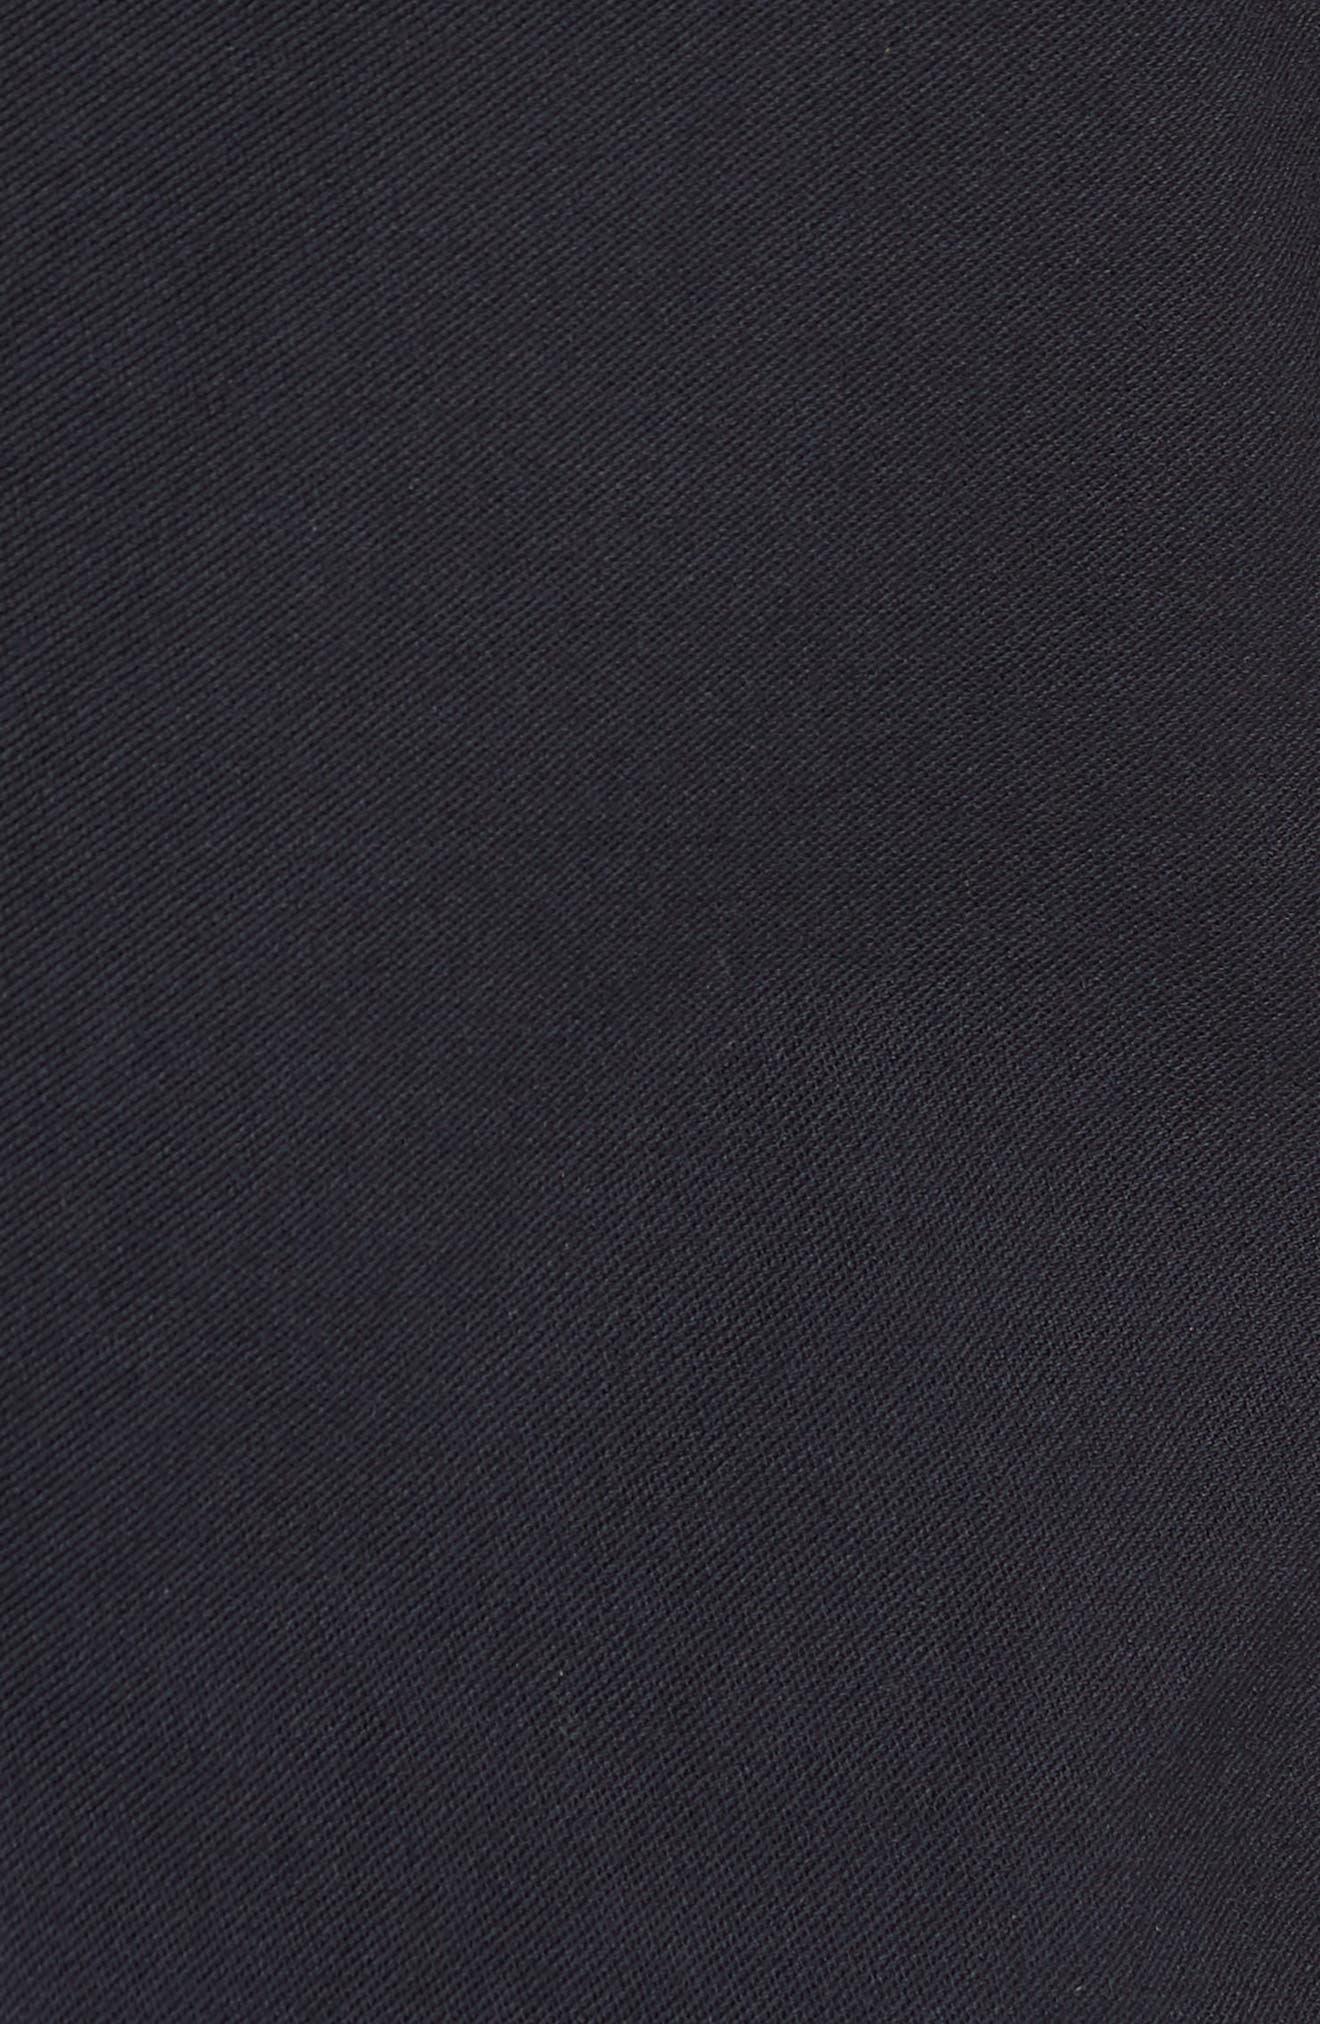 Lake Forsyth Regular Fit Blazer,                             Alternate thumbnail 5, color,                             Midnight